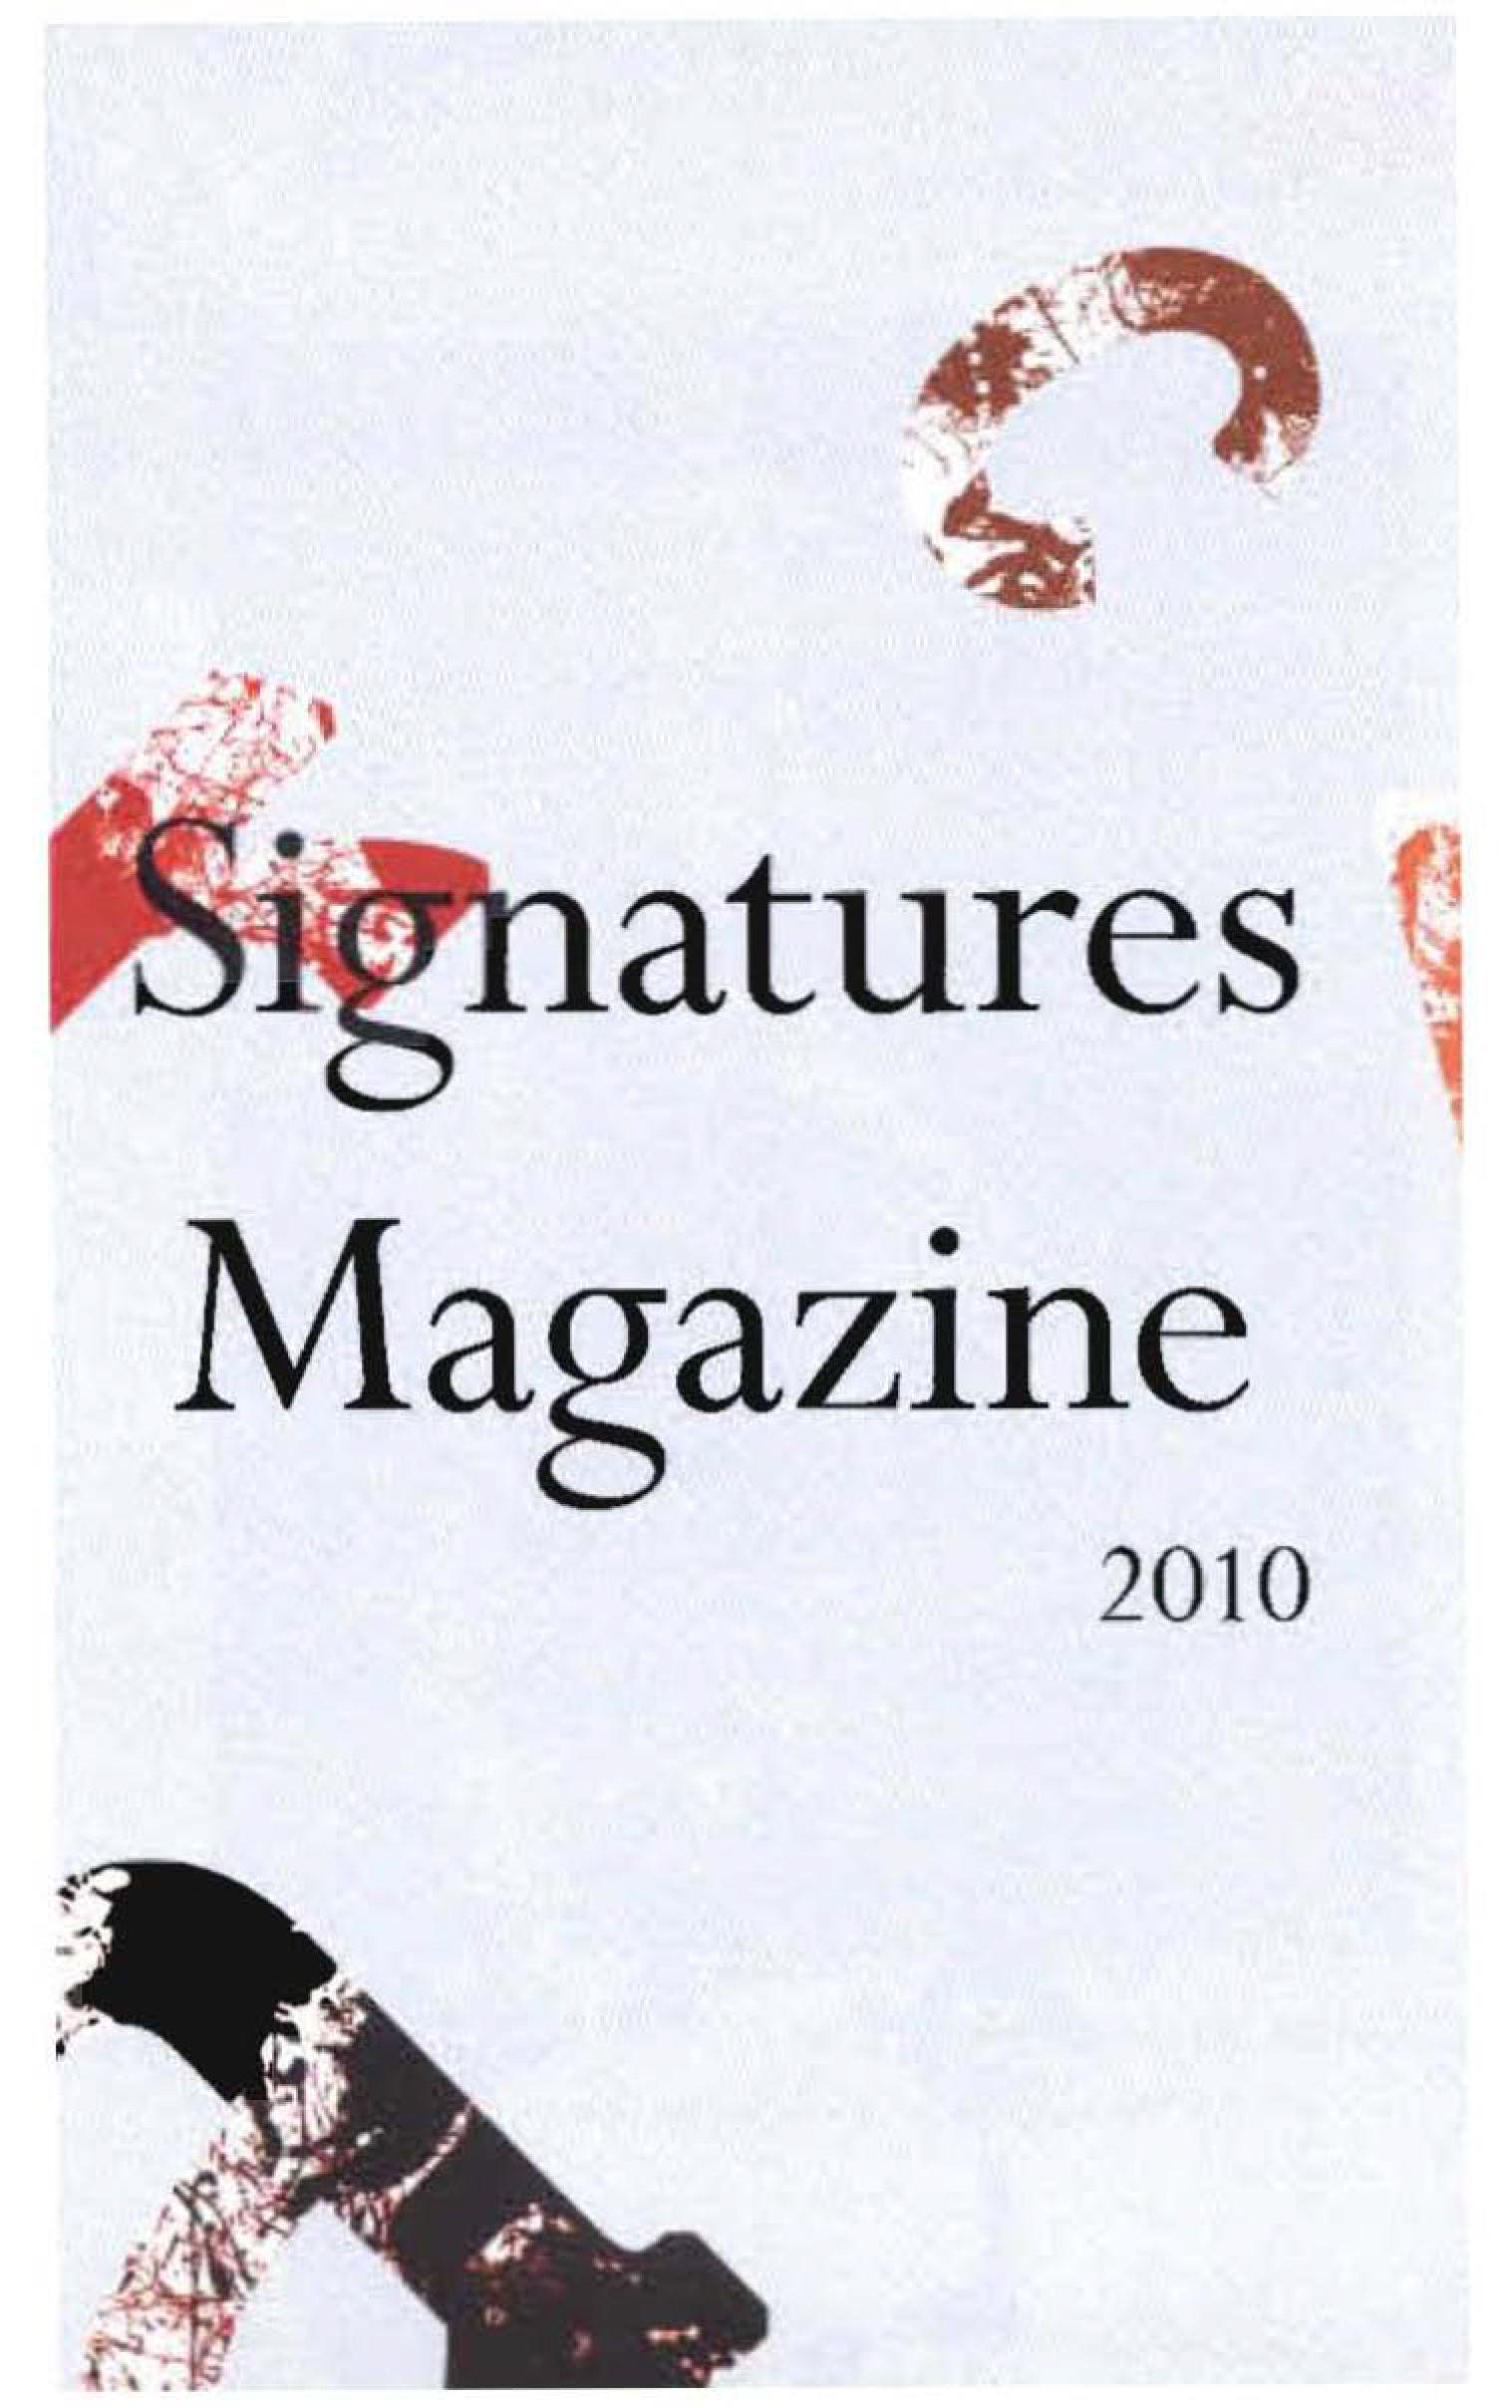 SignaturesBook2010-3.jpg